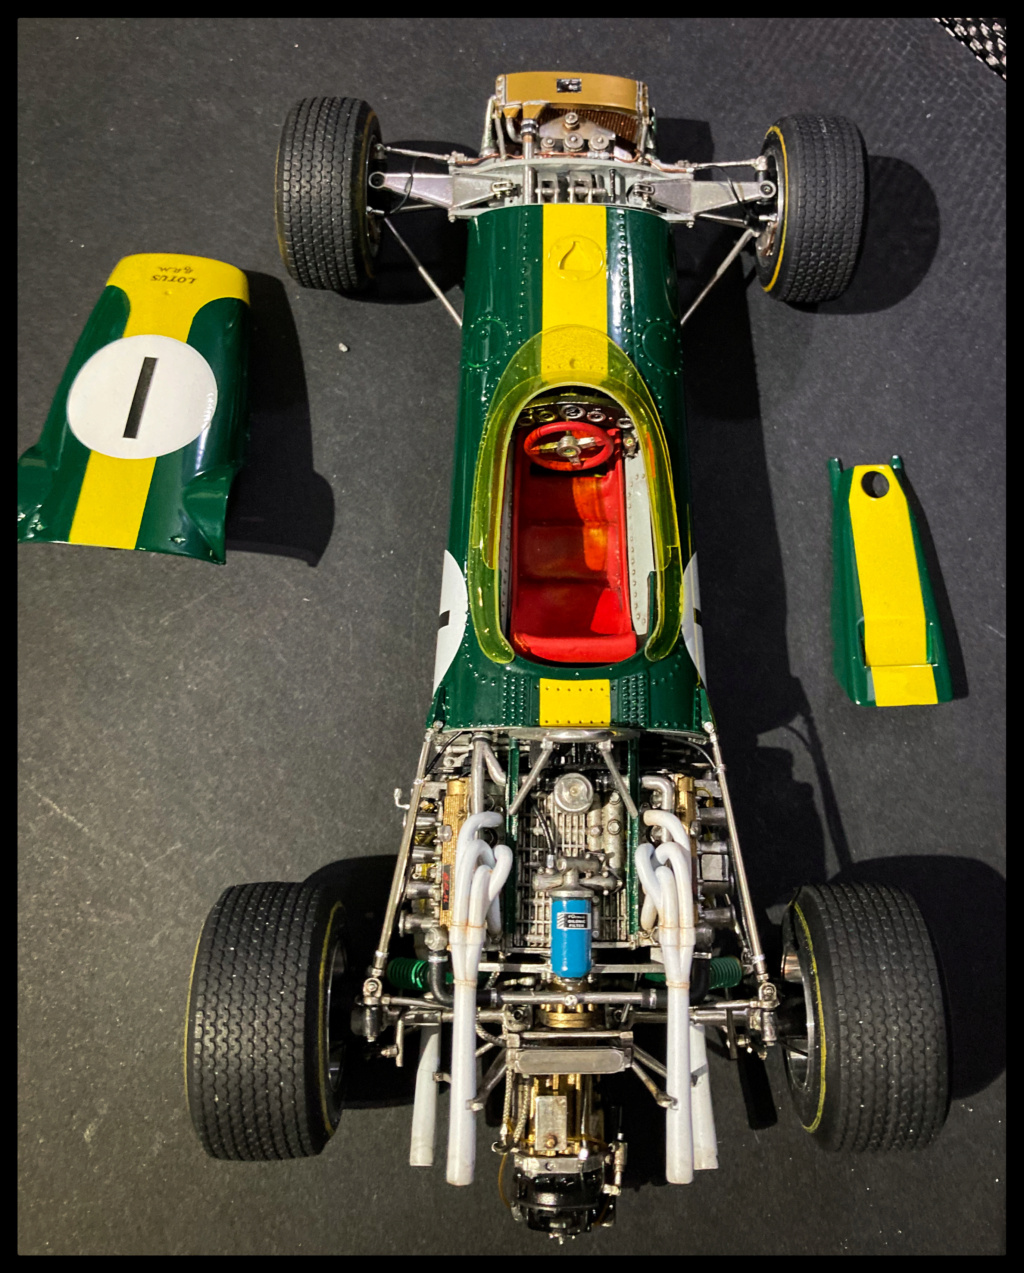 Lotus 43 BRM, Jim Clark, US GP 1966 Watkins Glen. MFH 1/20. 8a0a6410